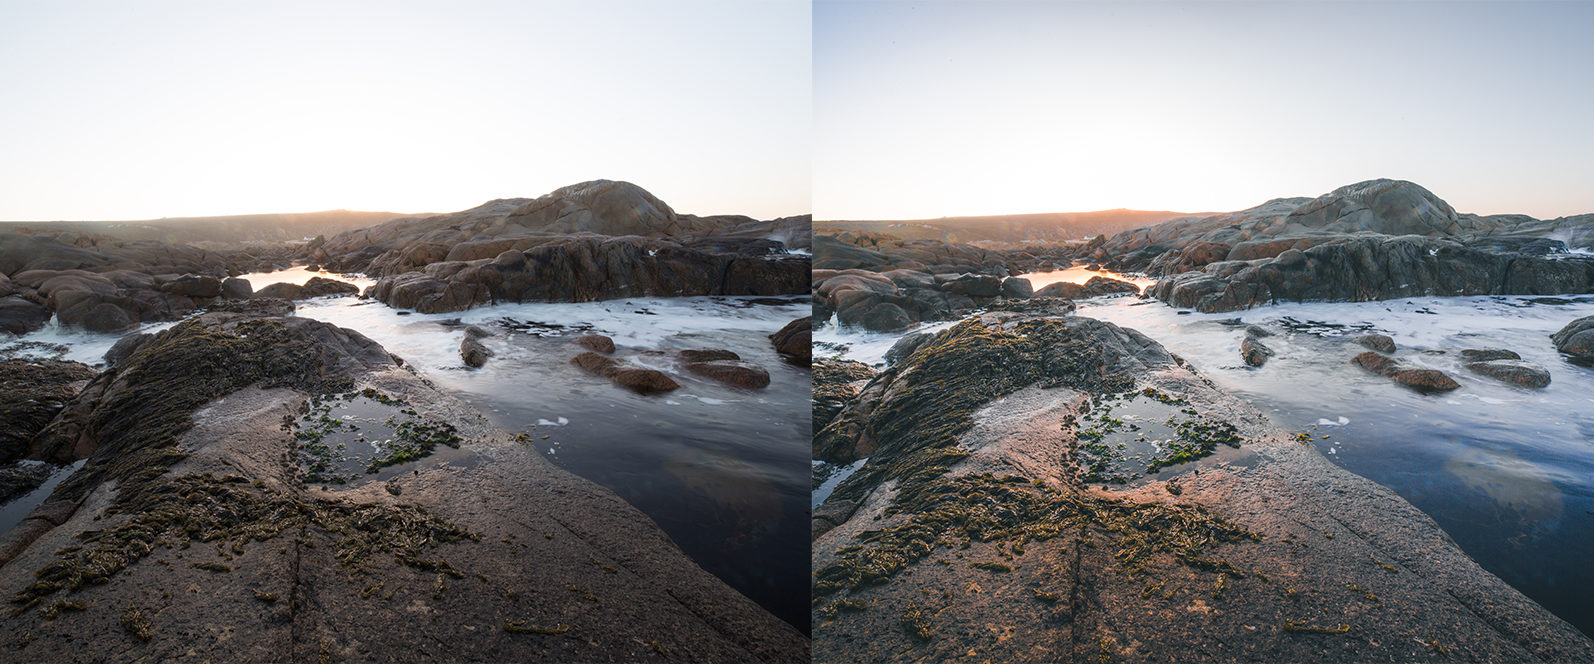 12 x Lightroom Presets, Cape Columbine, Beach and Ocean Presets, Seascape Presets - 7 Cape Columbine2 -